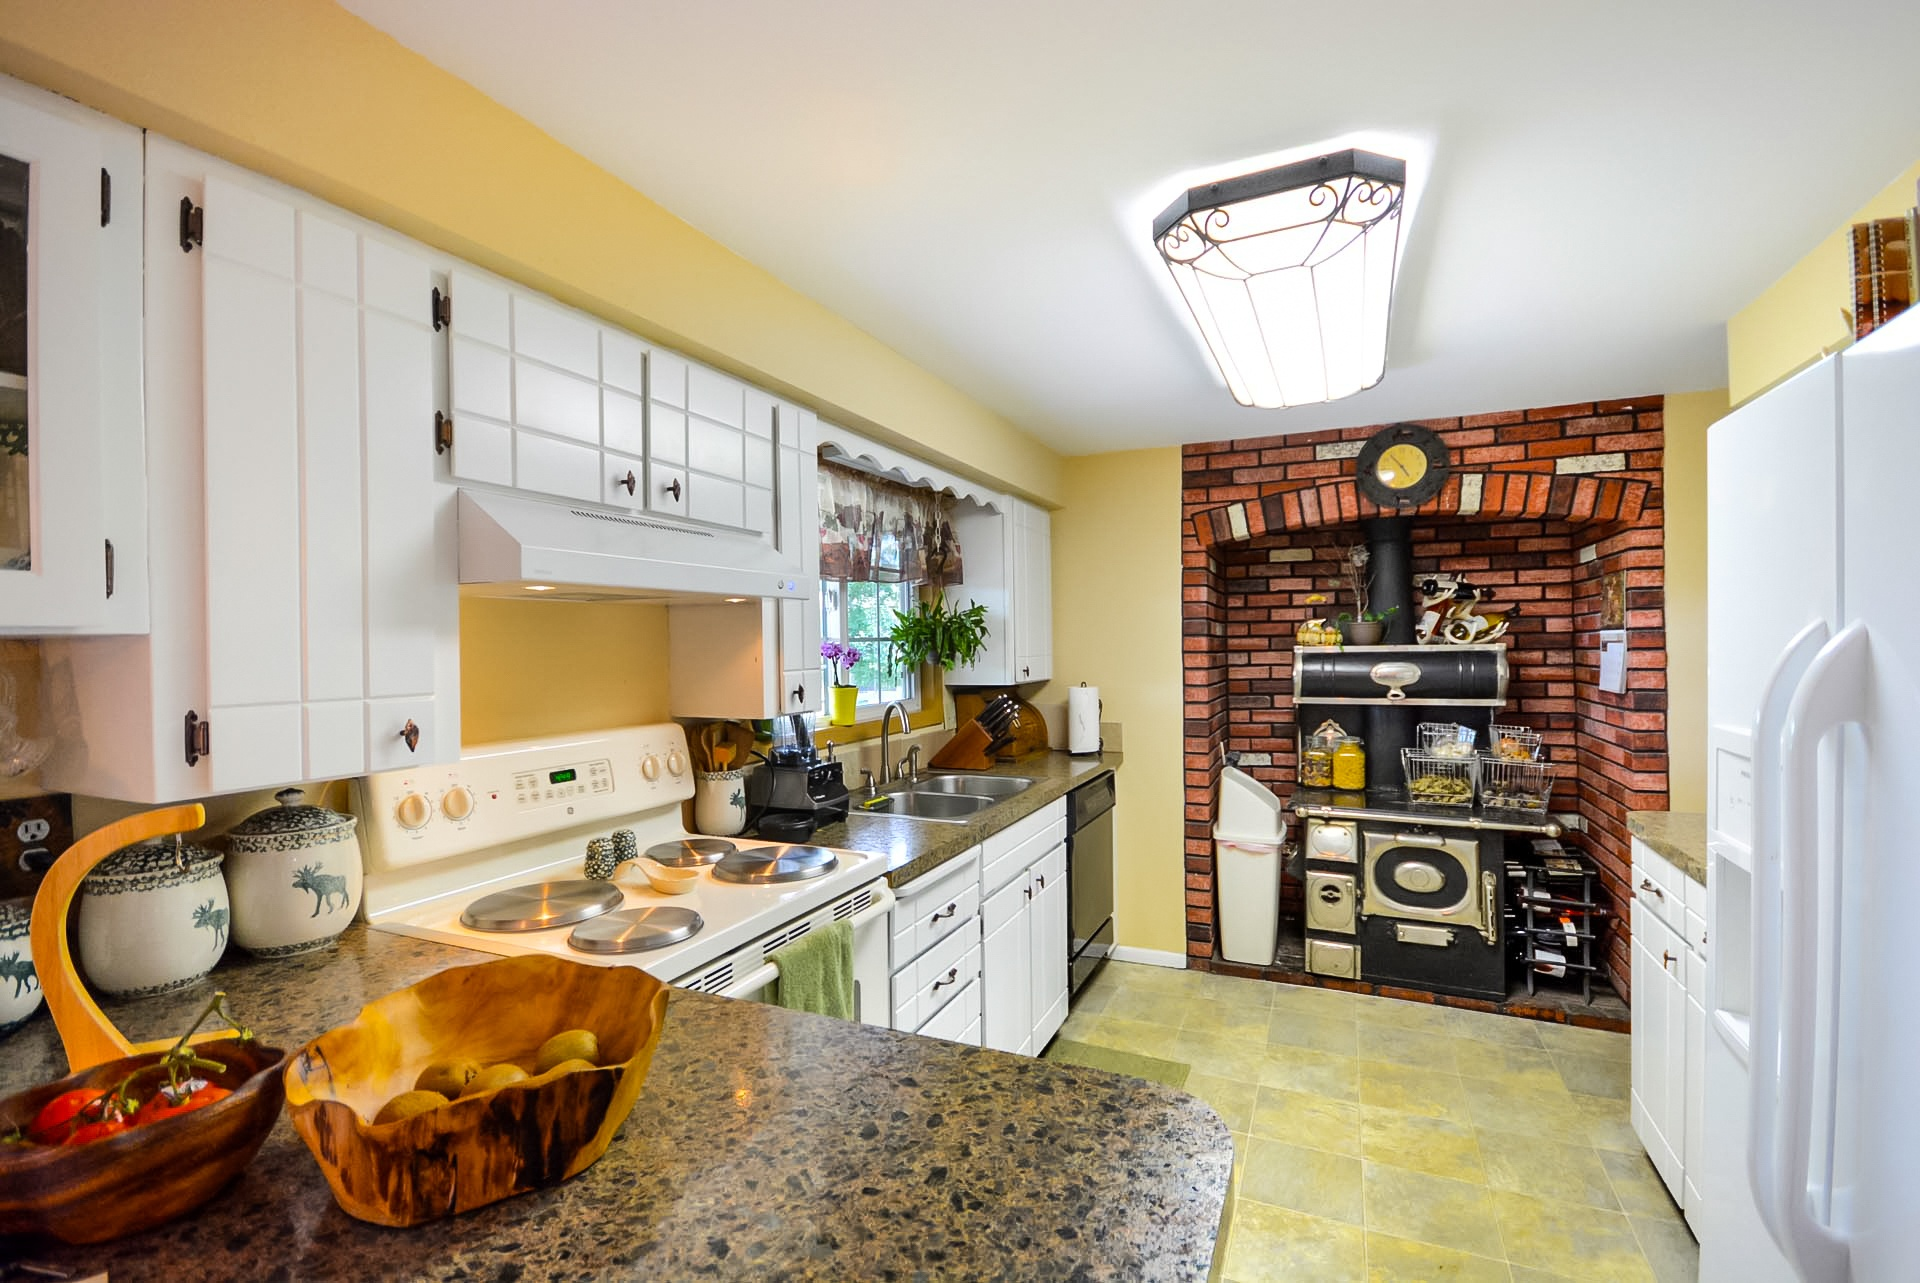 country-kitchen-1492641877uIa.jpg